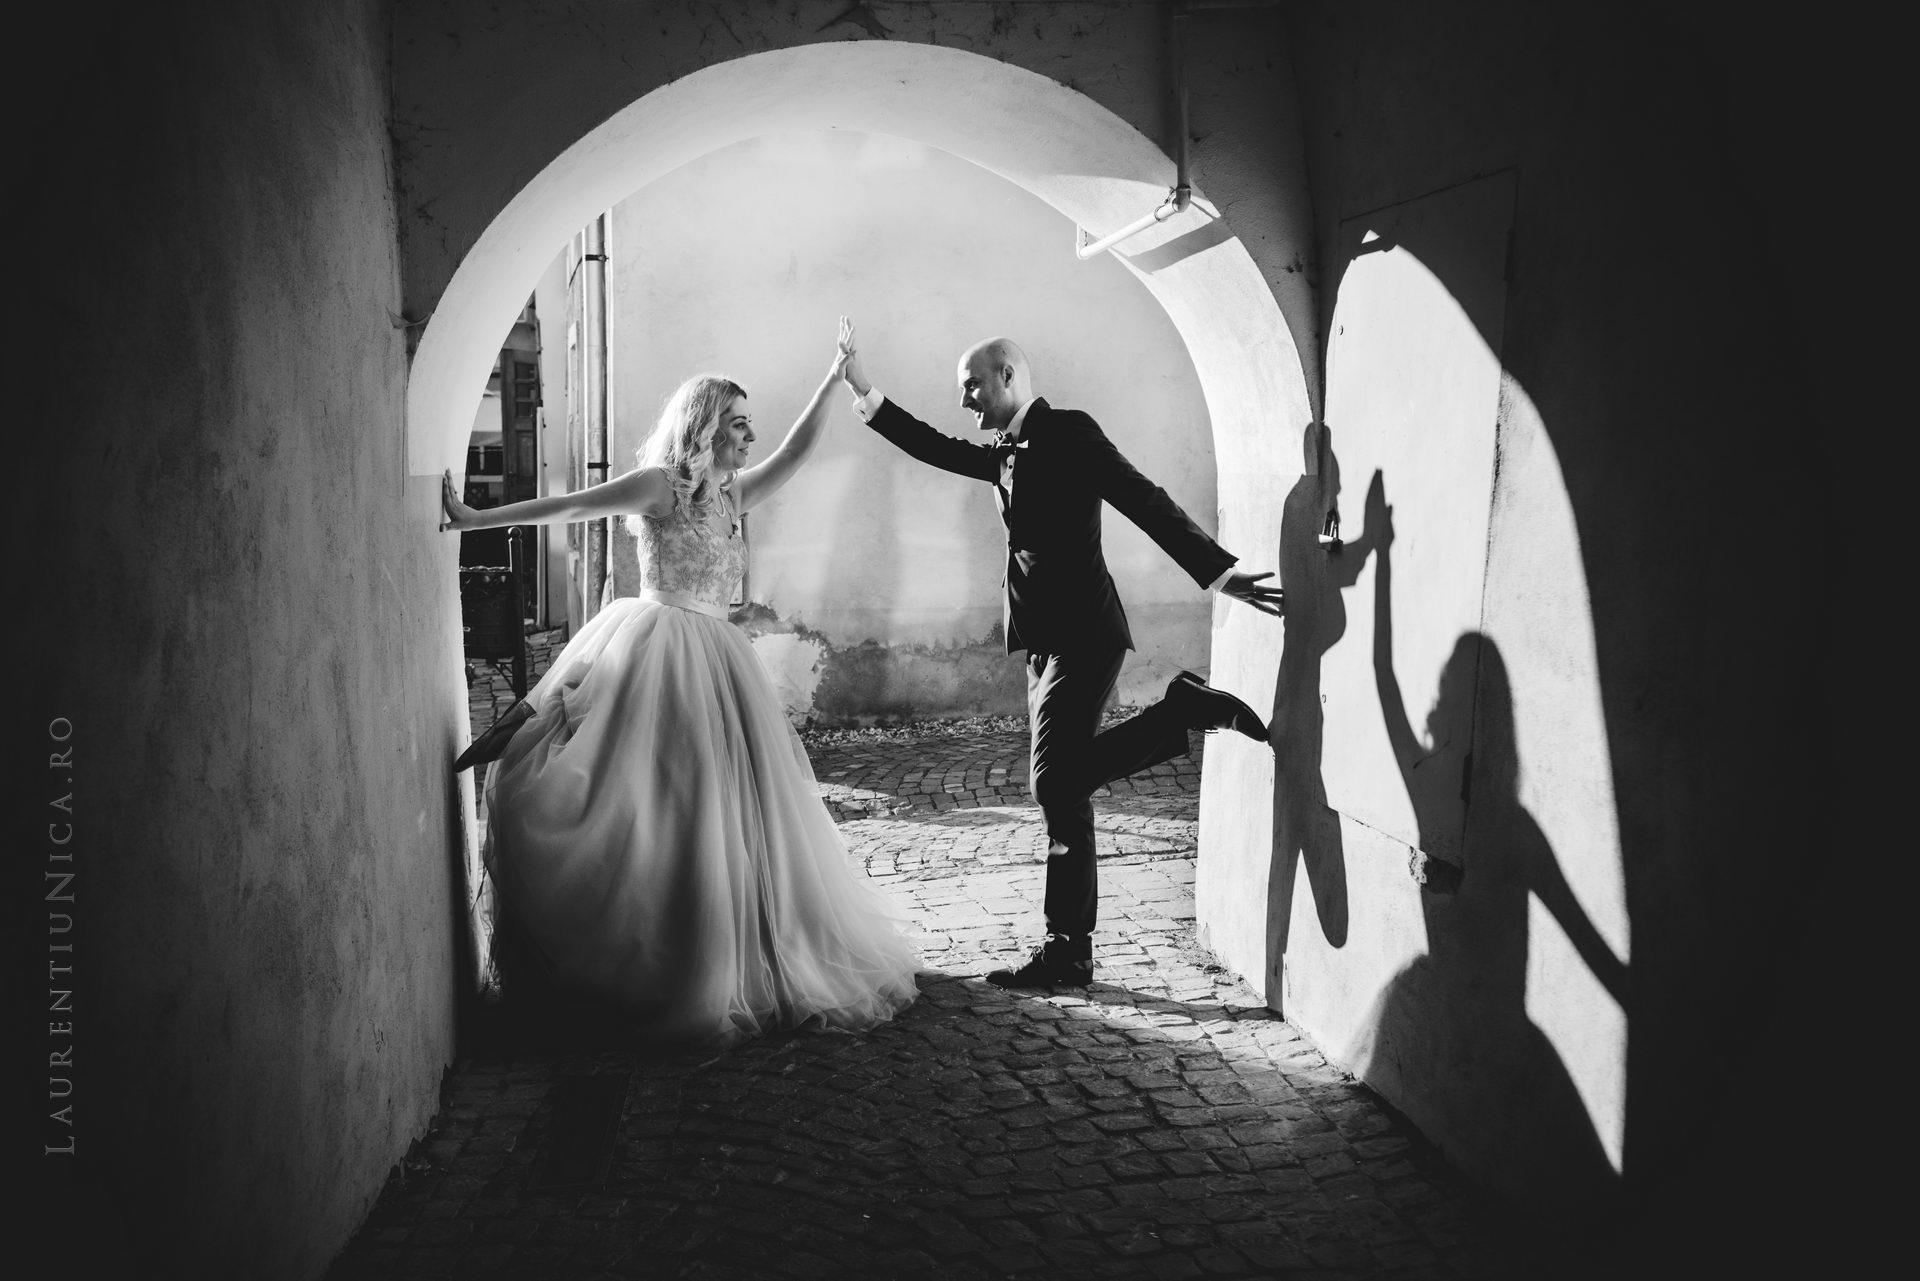 lavinia si adi fotograf laurentiu nica sighisoara biertan 057 - Lavinia & Adi | Fotografii After Wedding | Sighisoara & Biertan